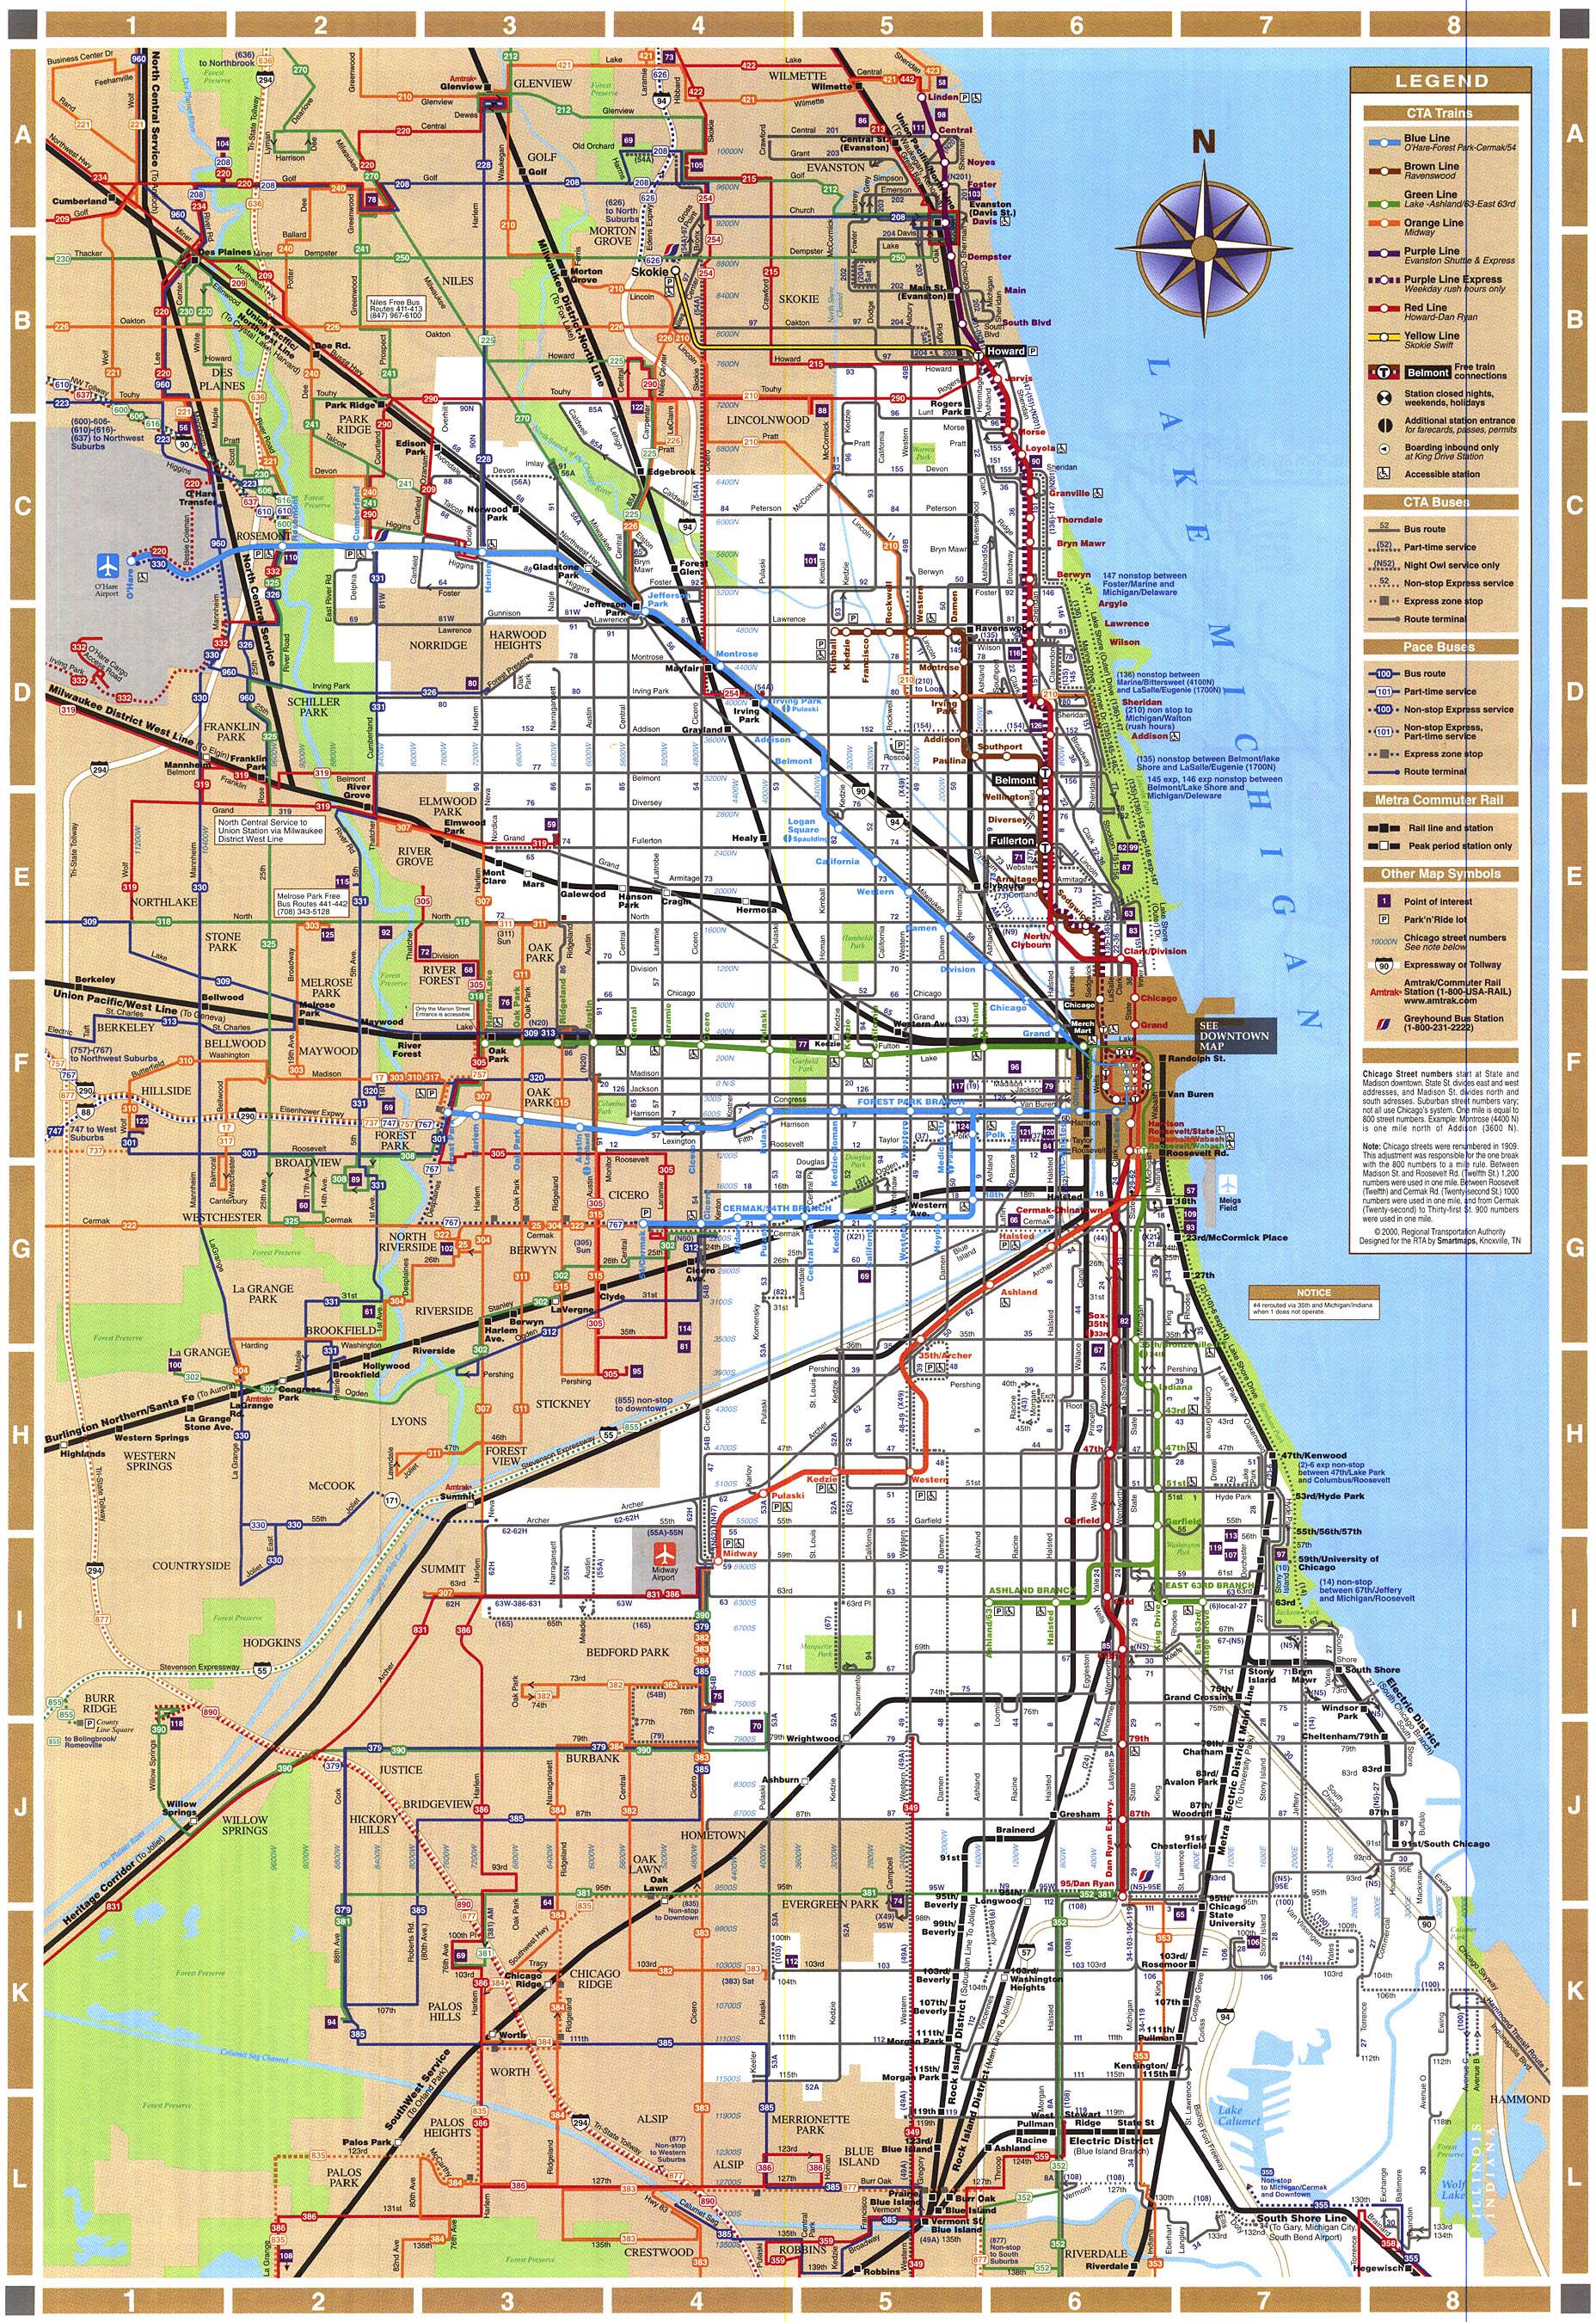 Public transportation maps homes neighborhoods live